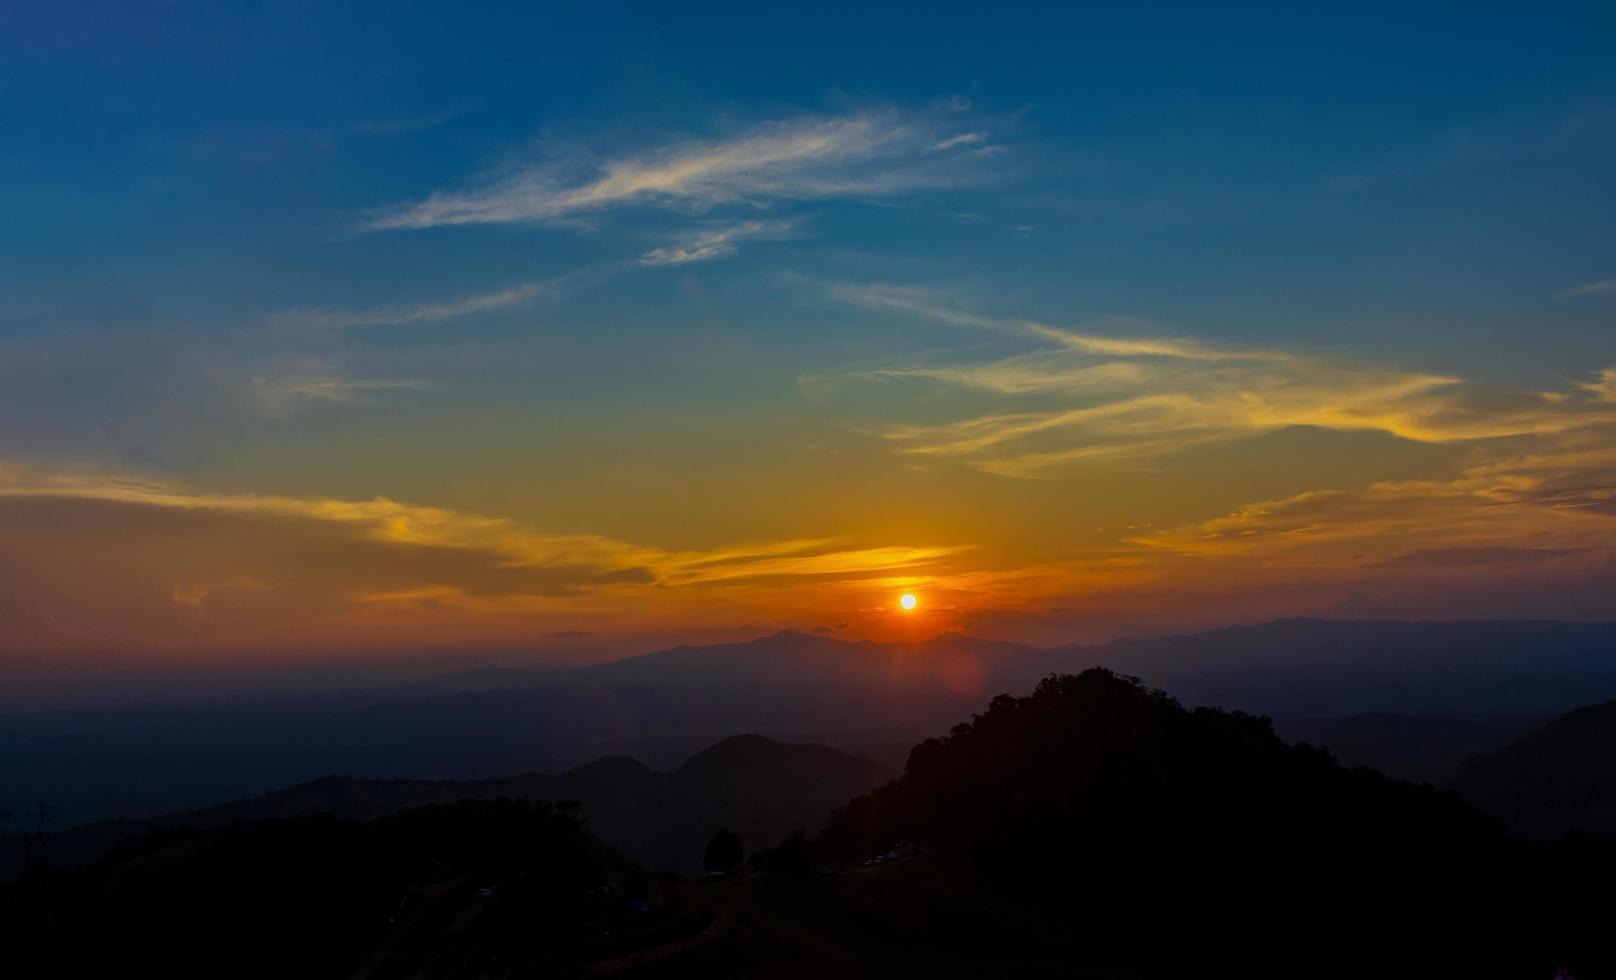 Sonnenuntergang über Berggipfeln foto